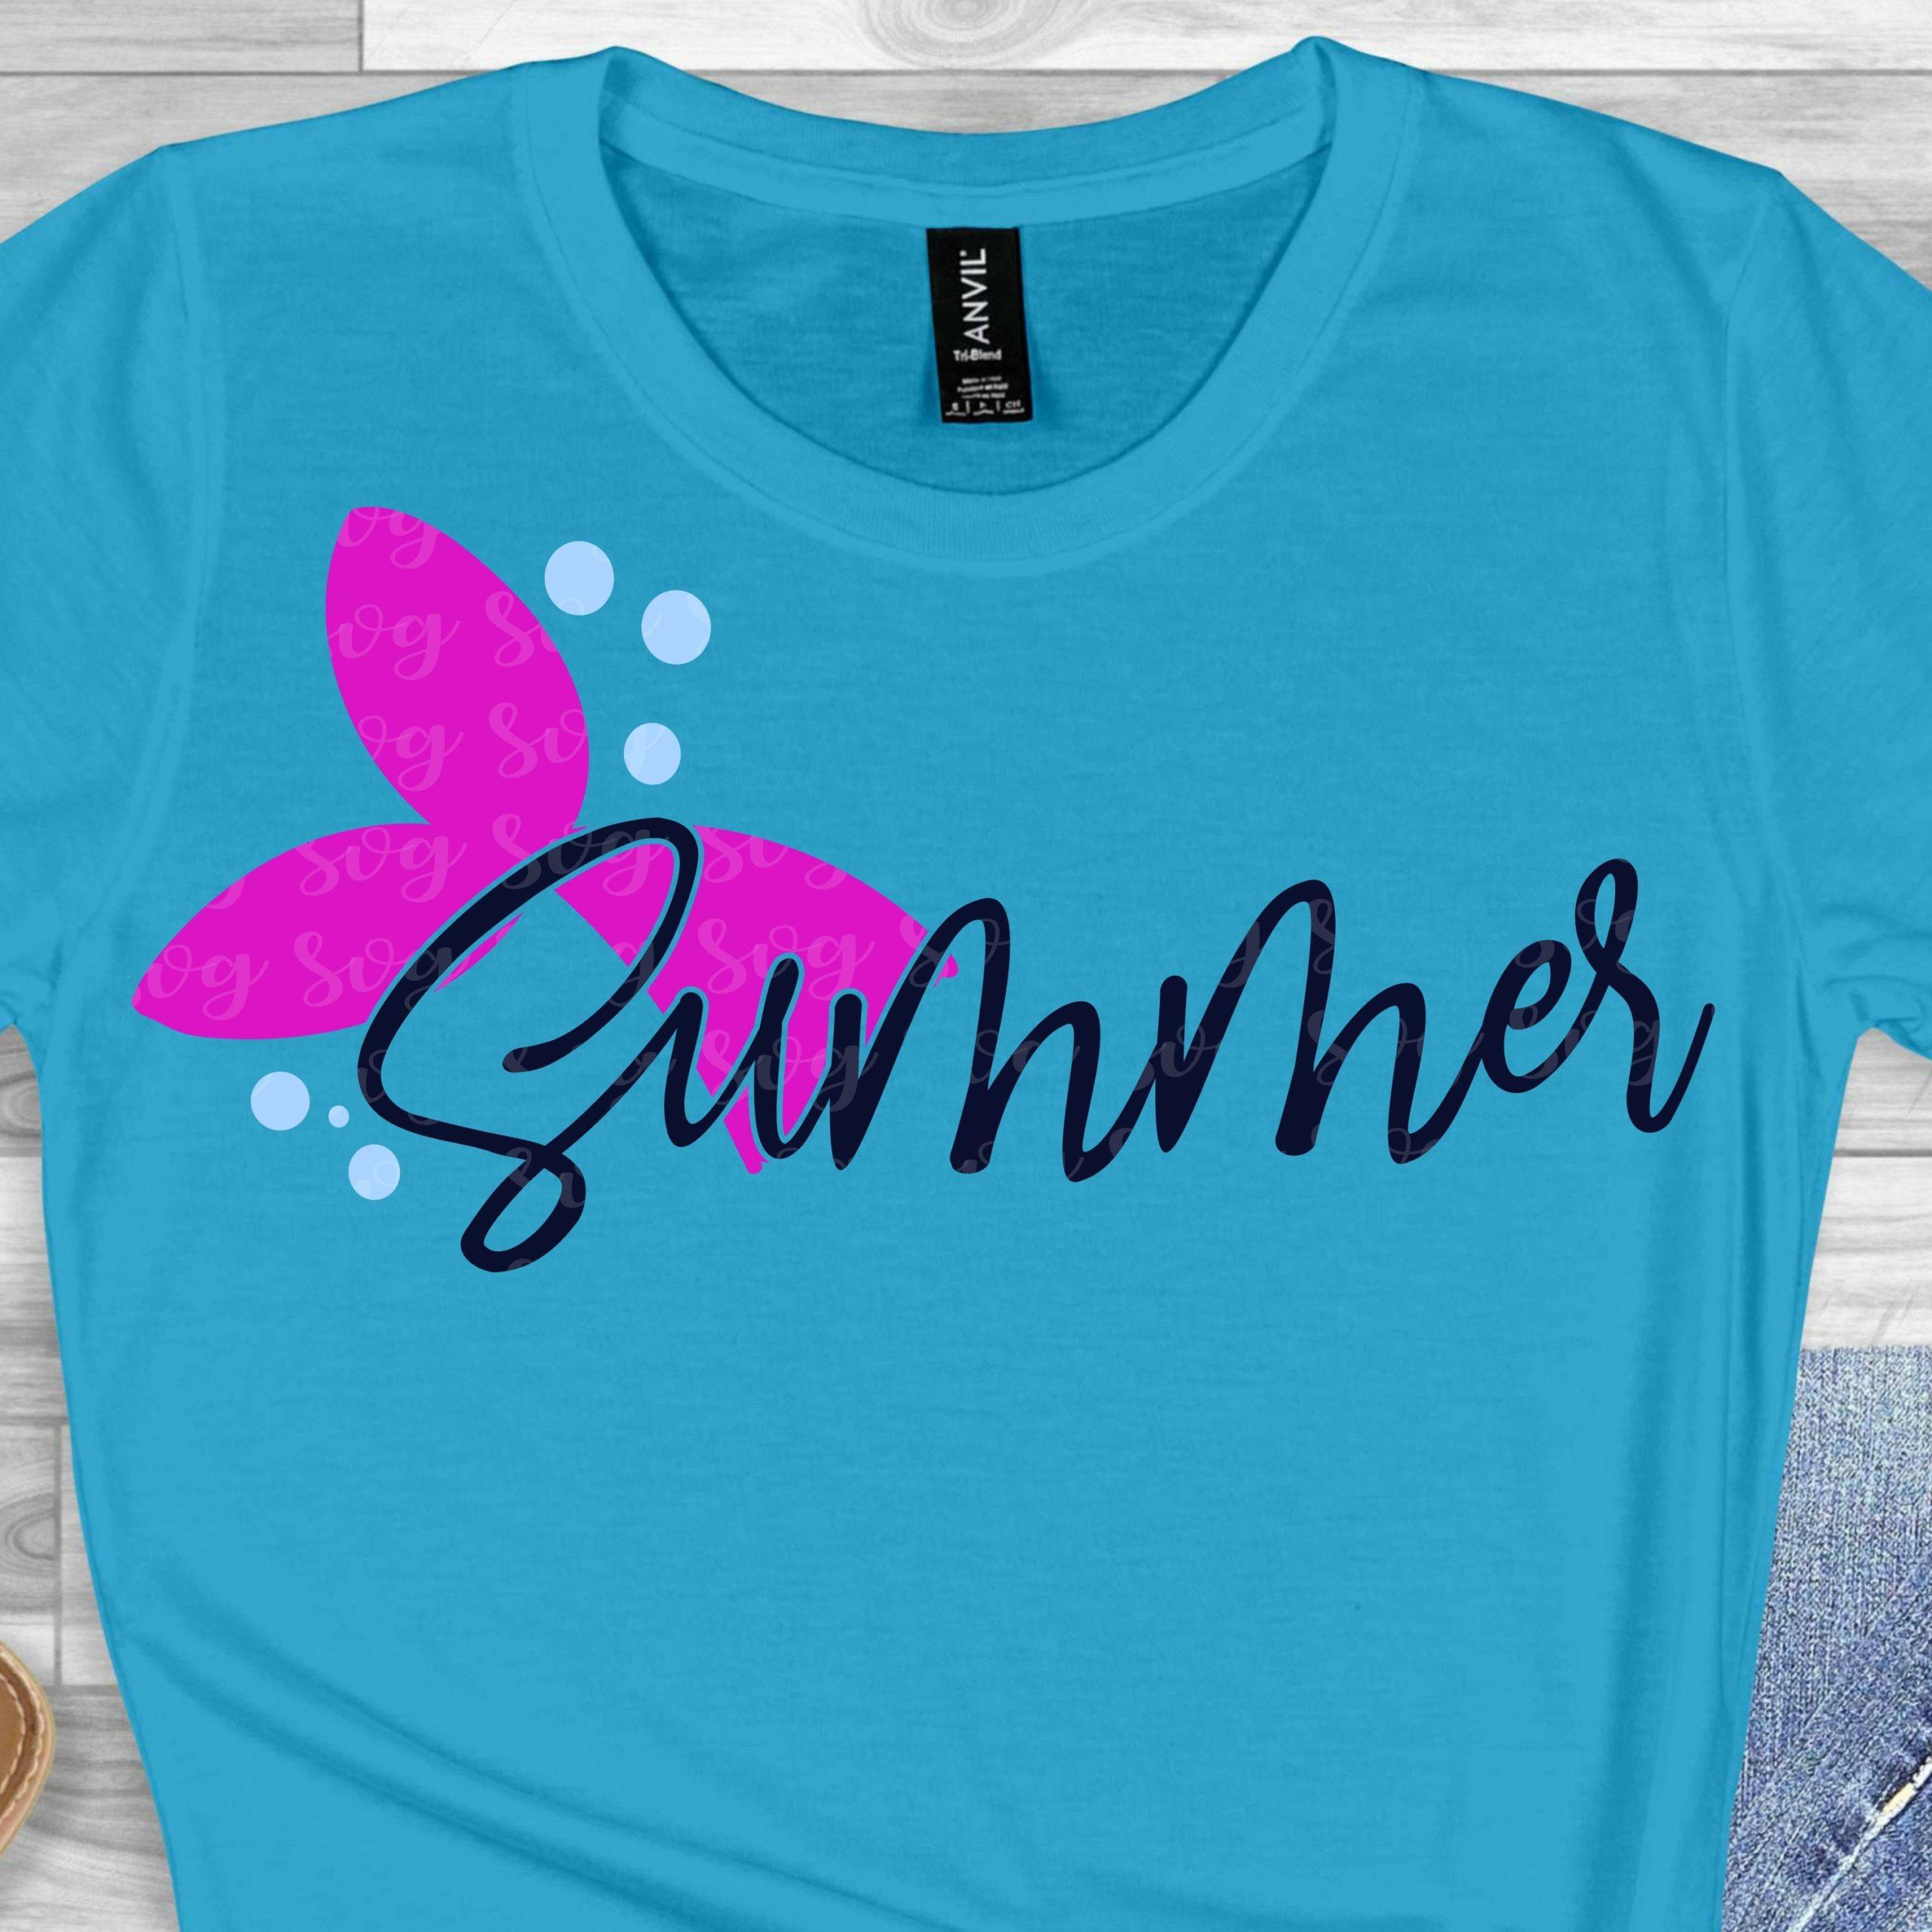 Mermaid-tail-svgbeach-svg-summer-mermaid-svg-summer-svg-summertime-svgbeach-life-svg-beachy-svg-for-cricut-retro-beach-svg-5ef78ca1